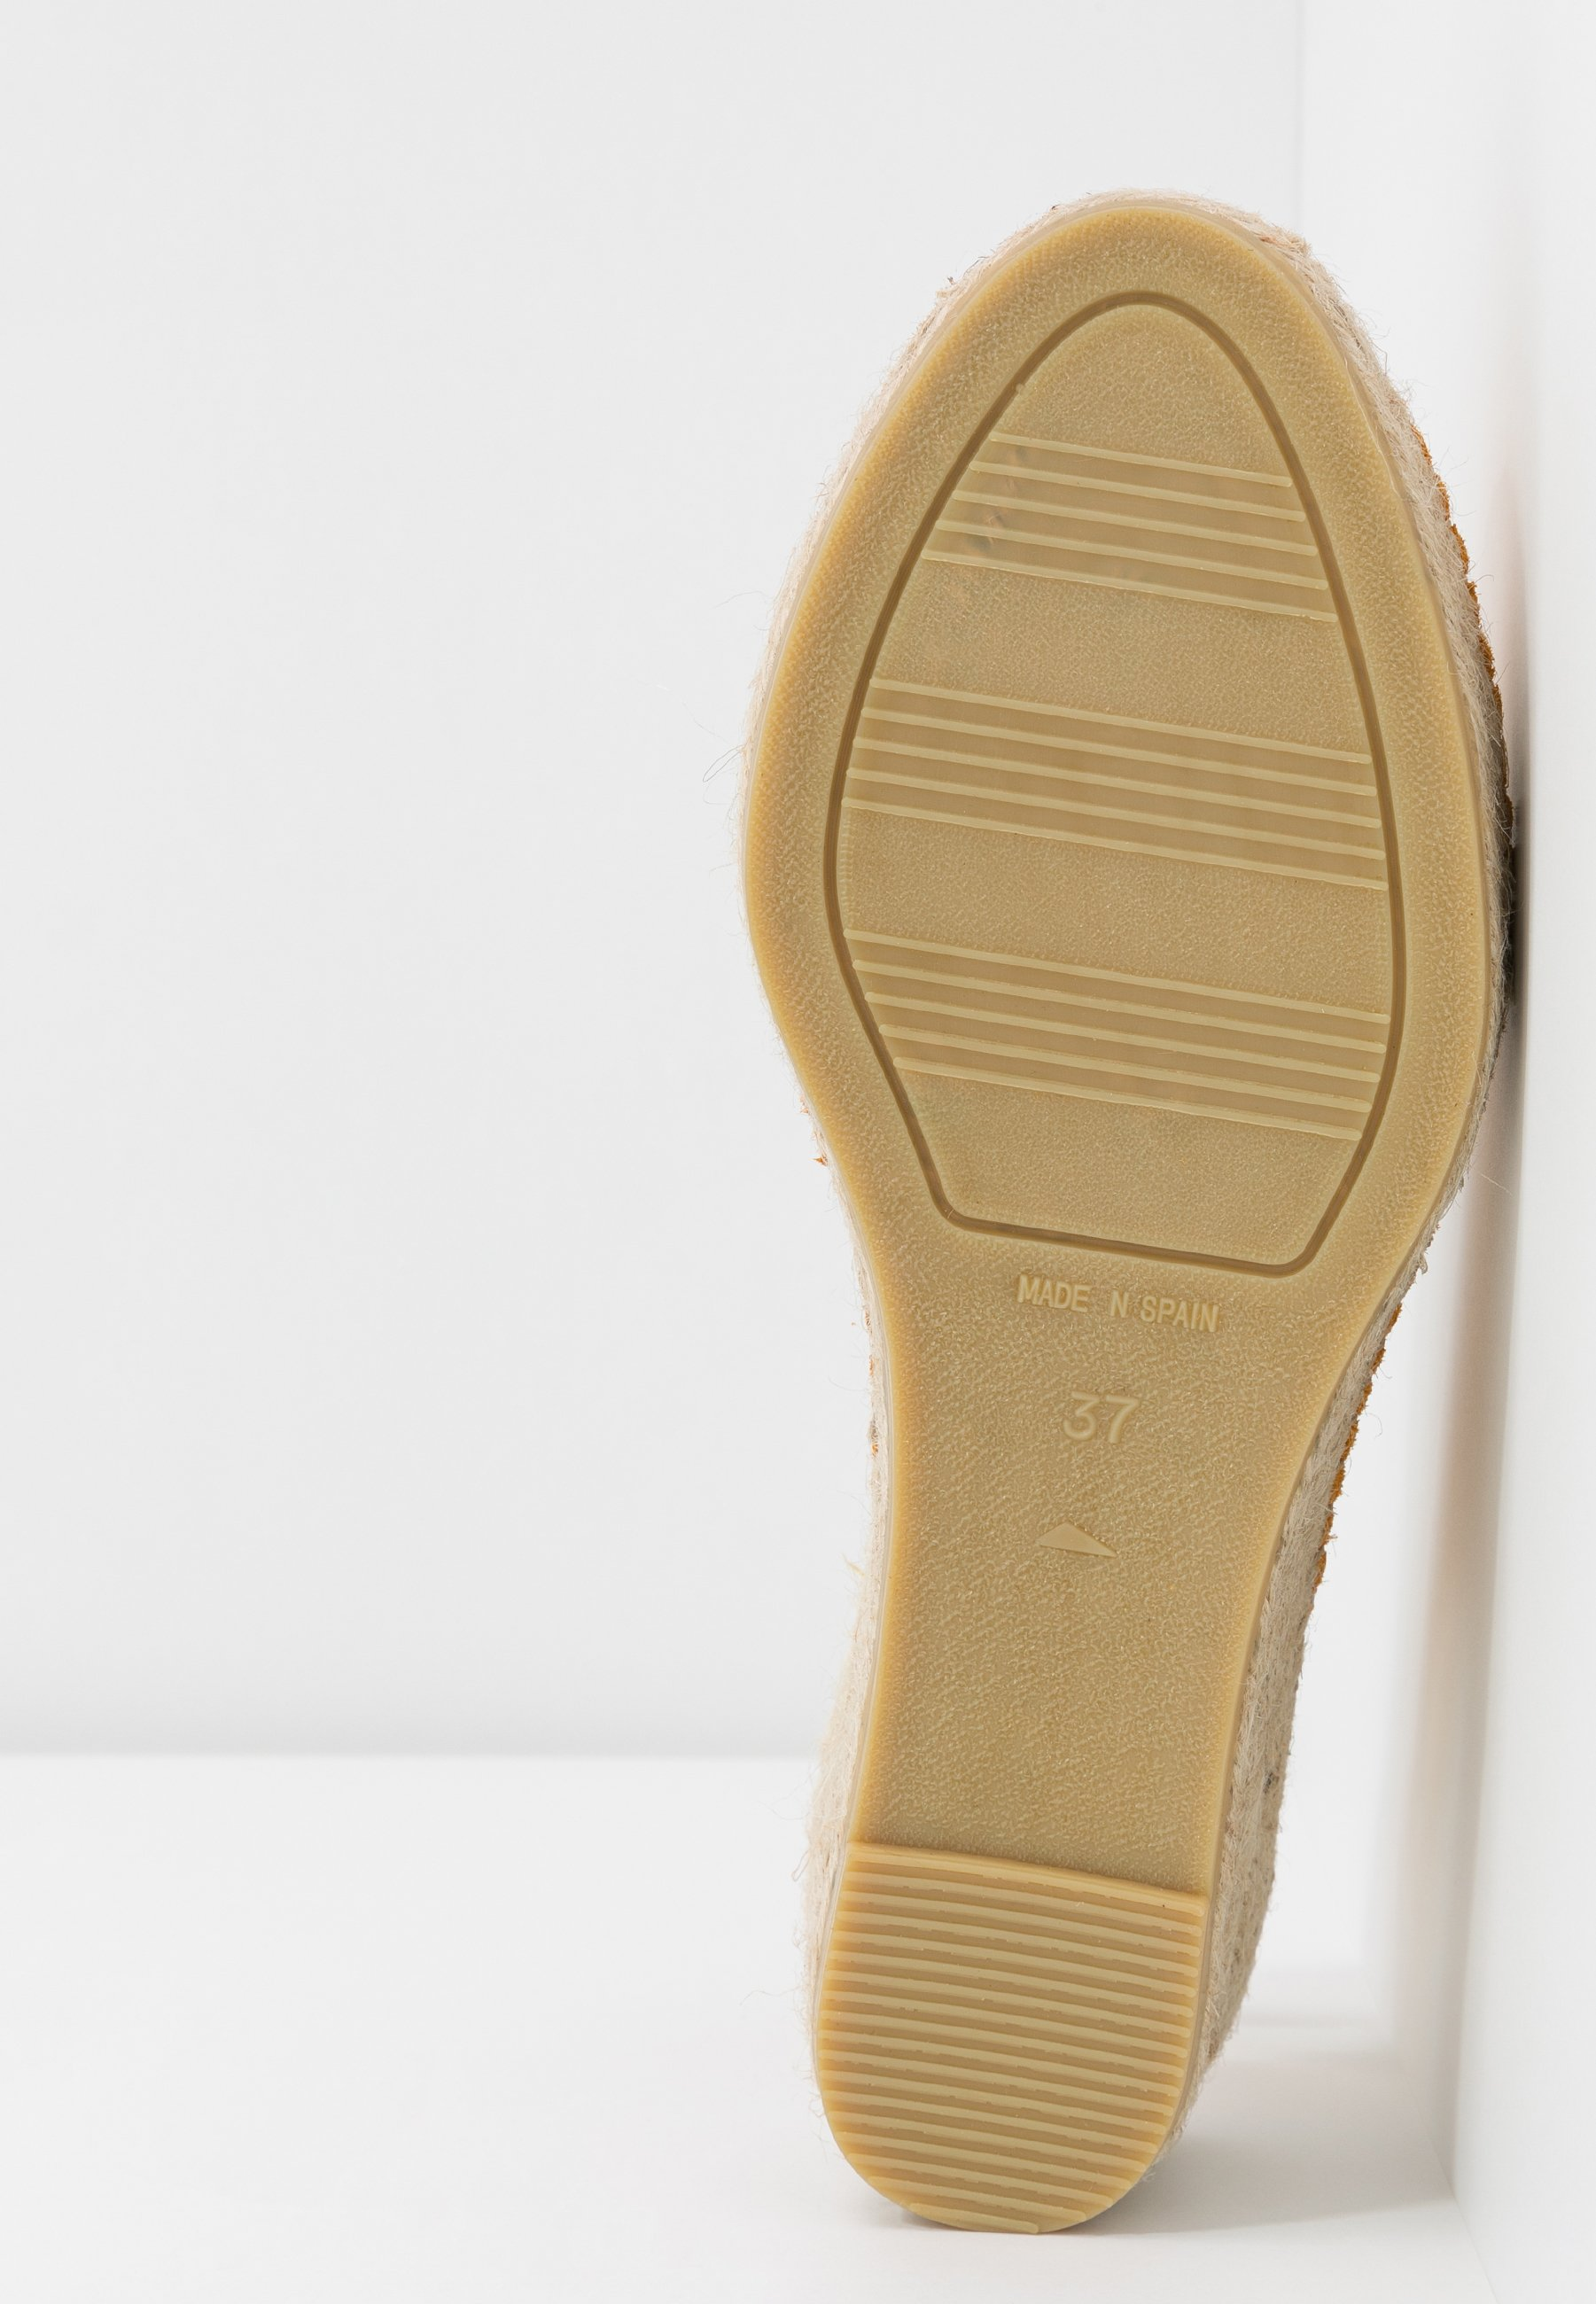 Wholesale Cheapest Vidorreta Espadrilles - mostaza | women's shoes 2020 lkTgt